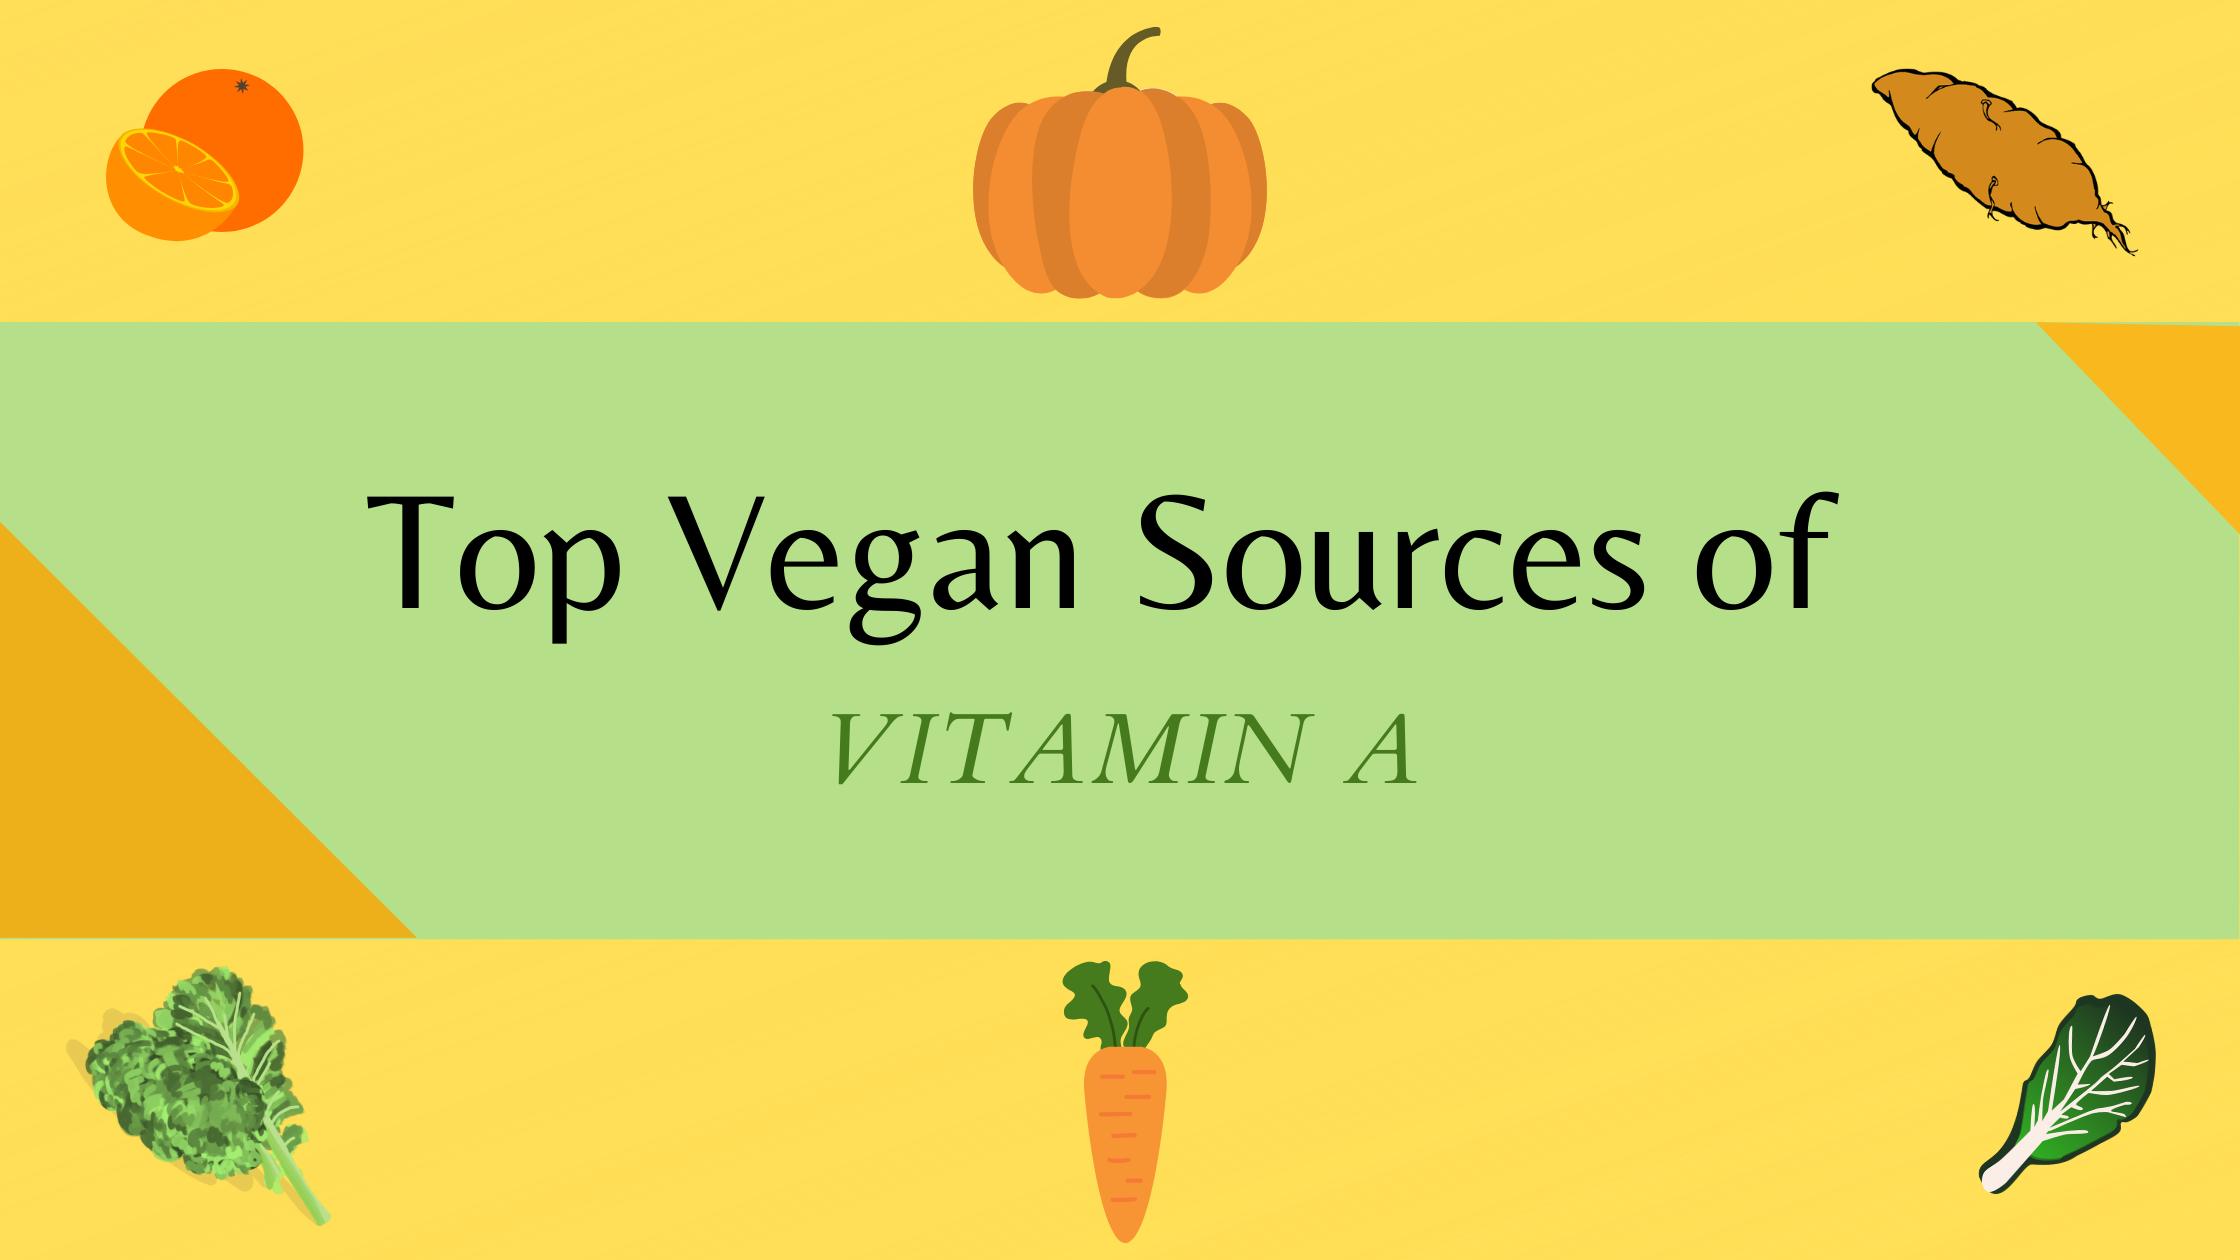 Vegan food sources rich in vitamin a